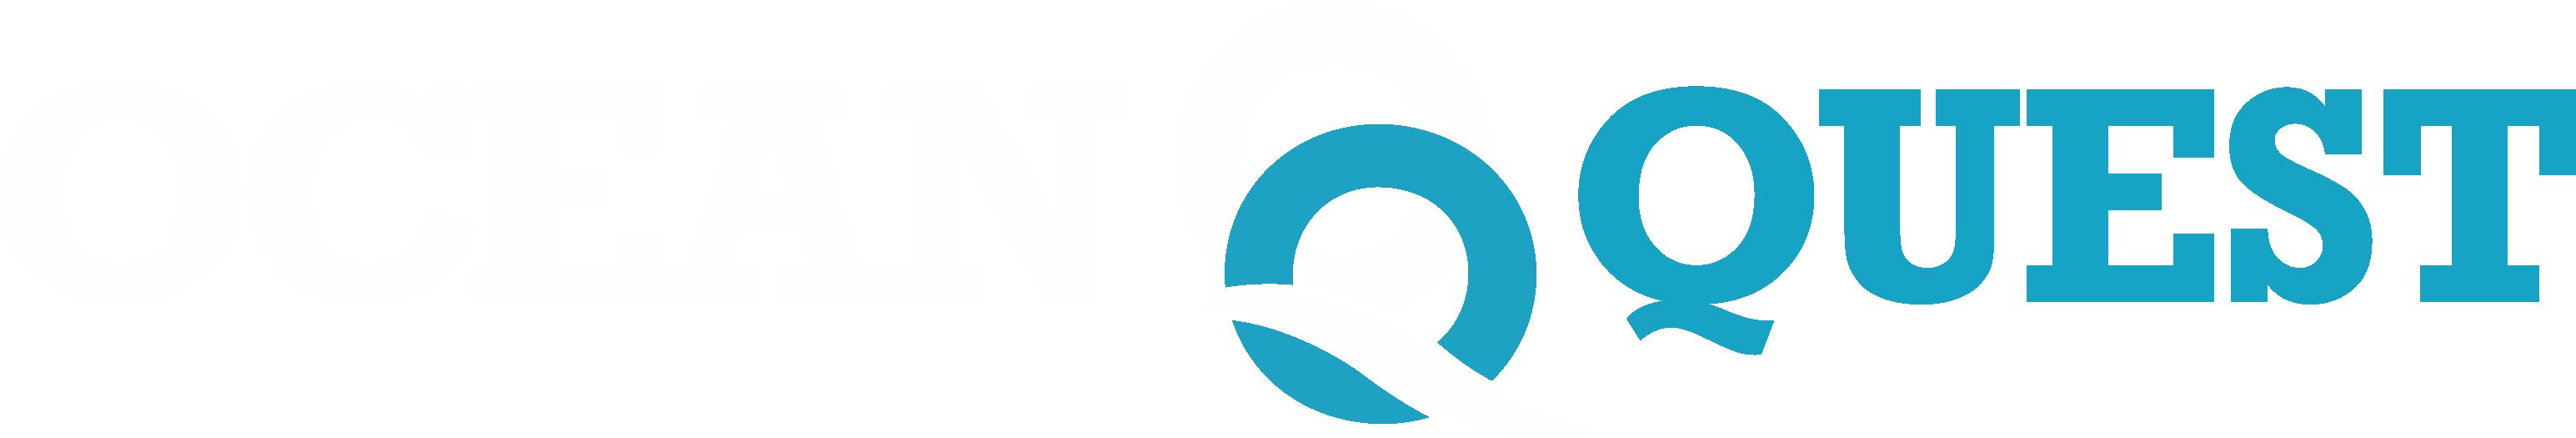 Bullseye Branding Inc. logo